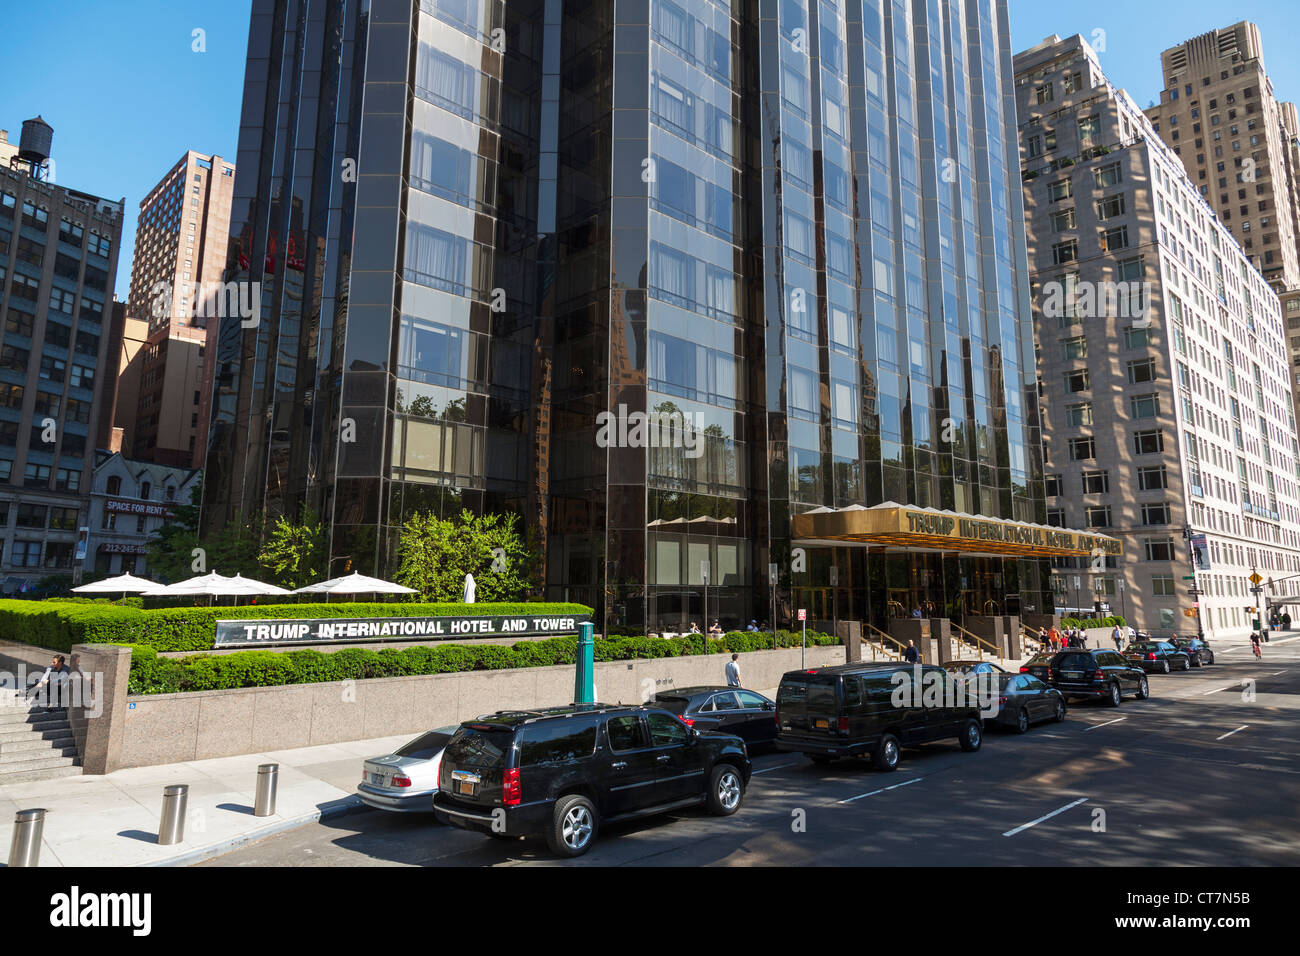 Stock photo trump international hotel manhattan new york city the entrance facade